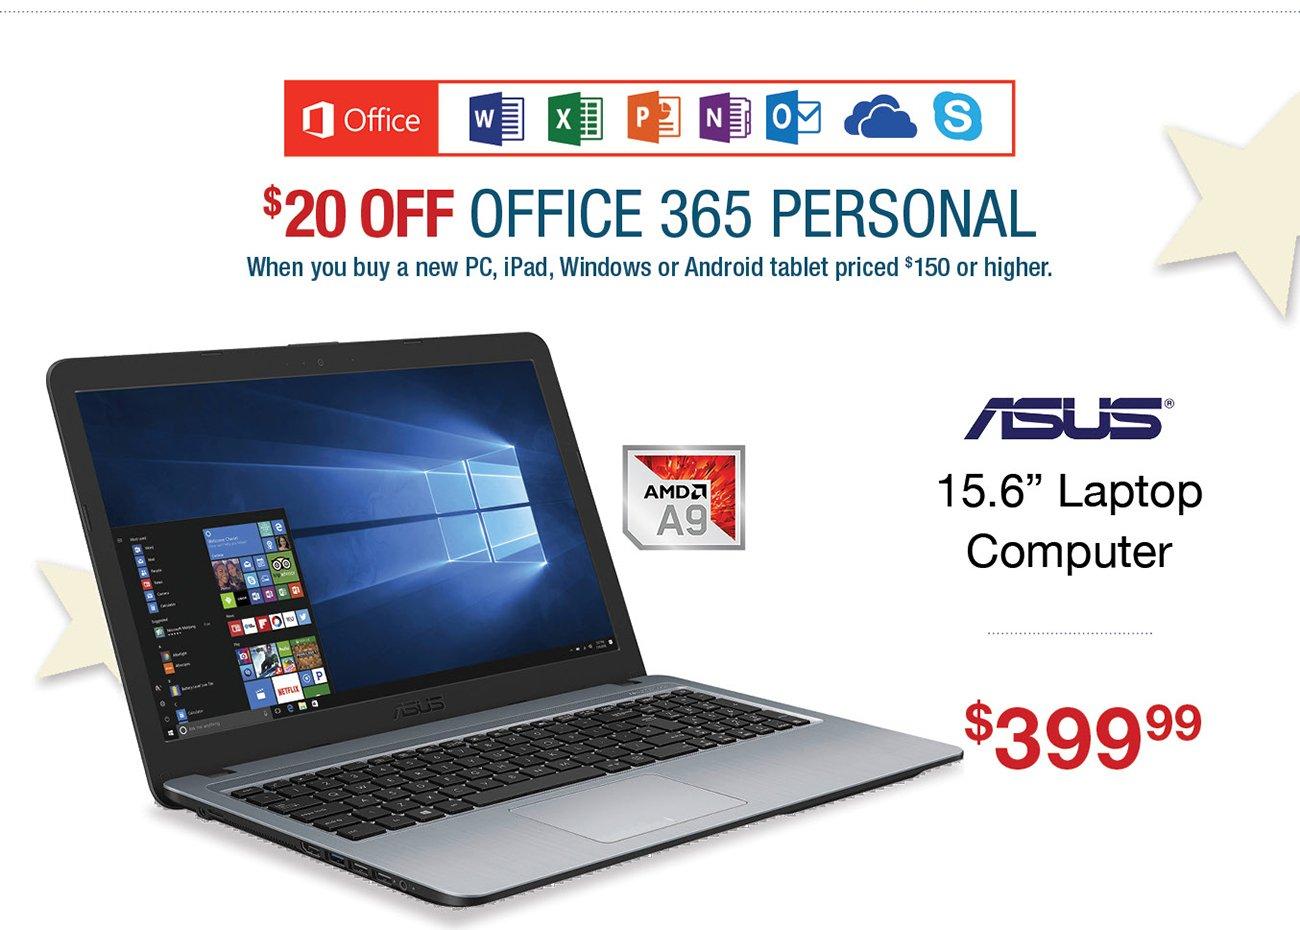 Asus-15.6-inch-laptop